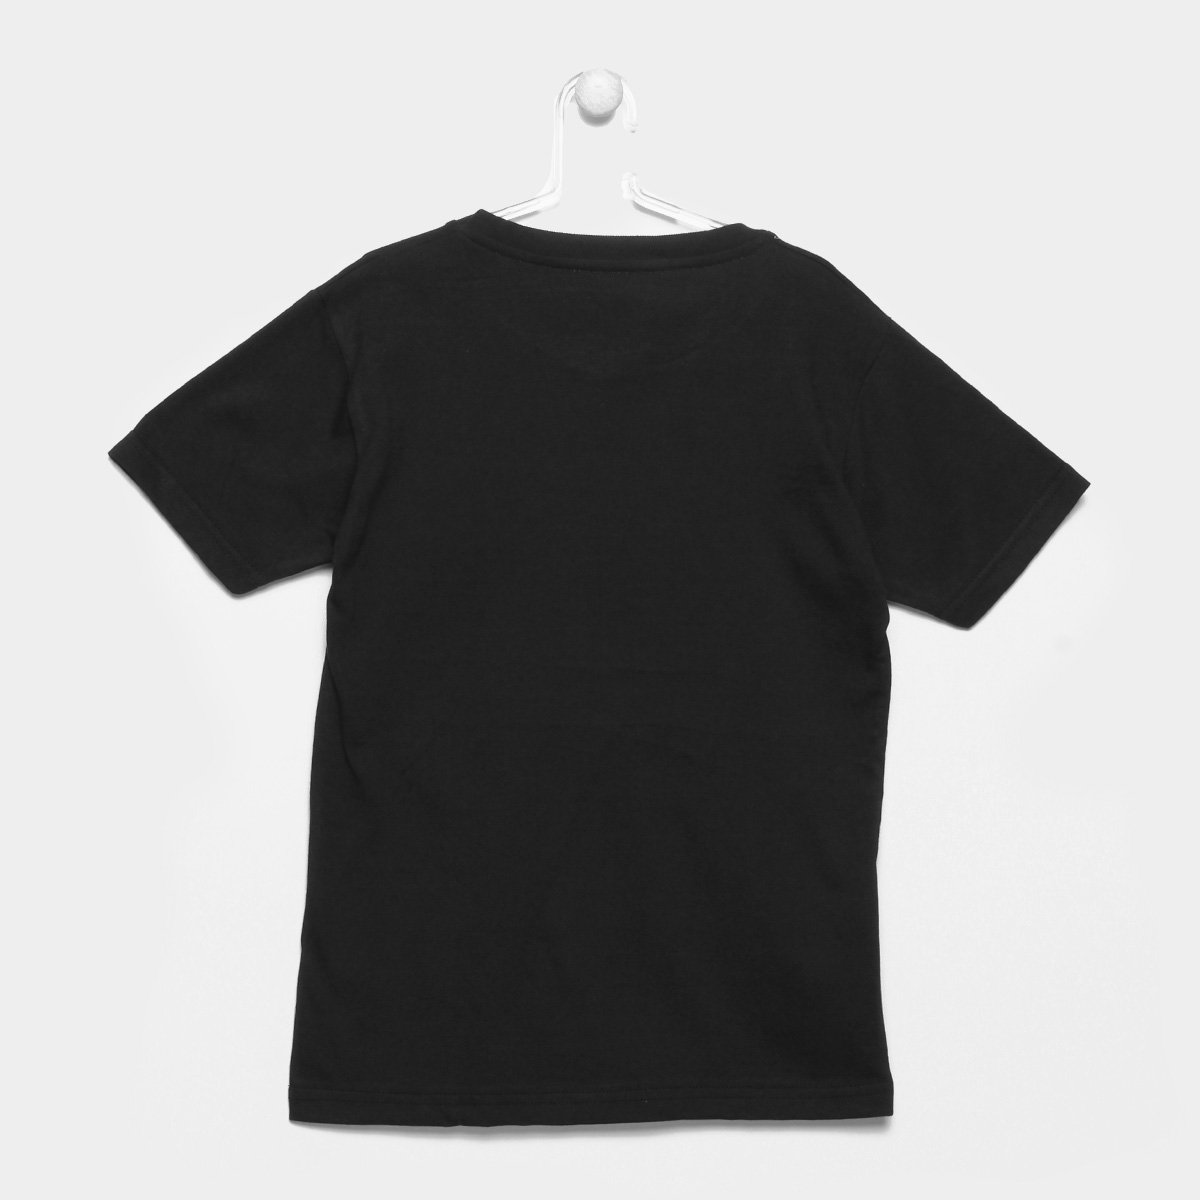 Foto 2 - Camiseta Infantil Tigor T. Tigre Surf Masculina